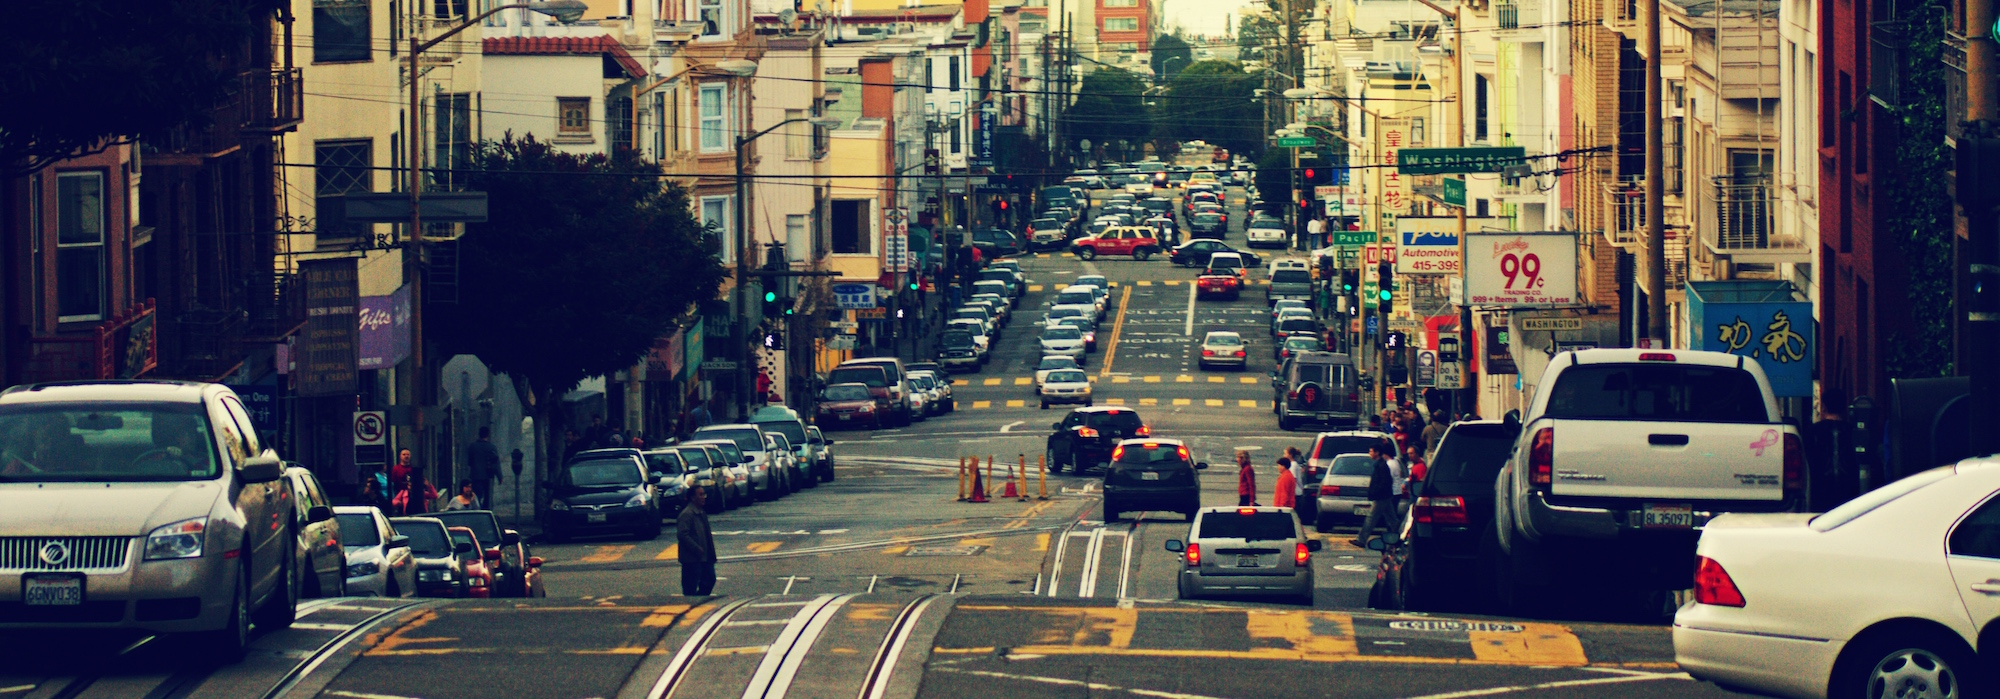 Powell_Street,_San_Francisco